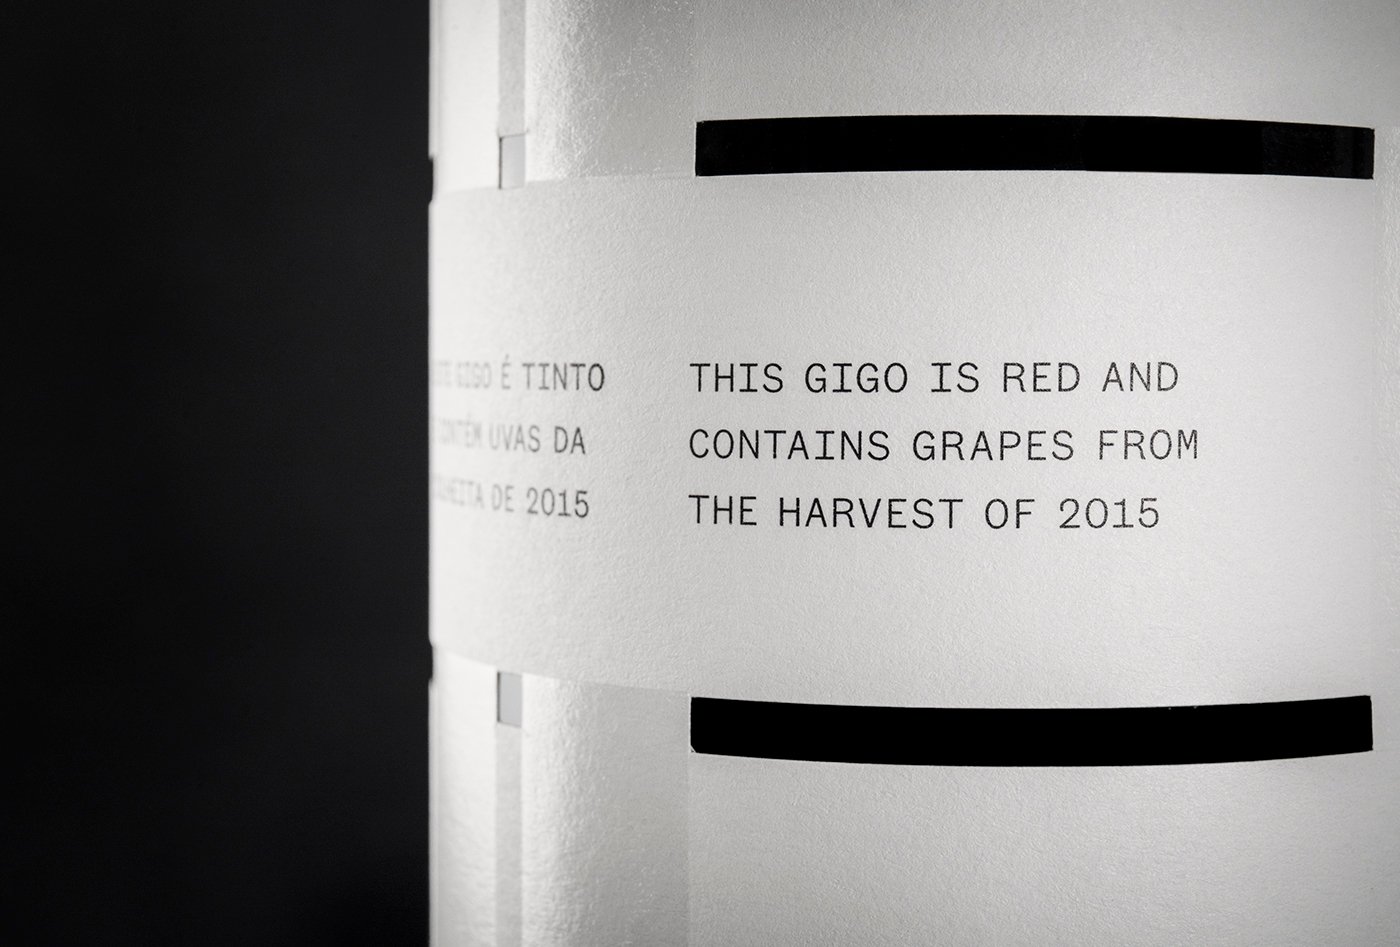 gigo+identity+and+packaging+by+www.gen-4.jpg